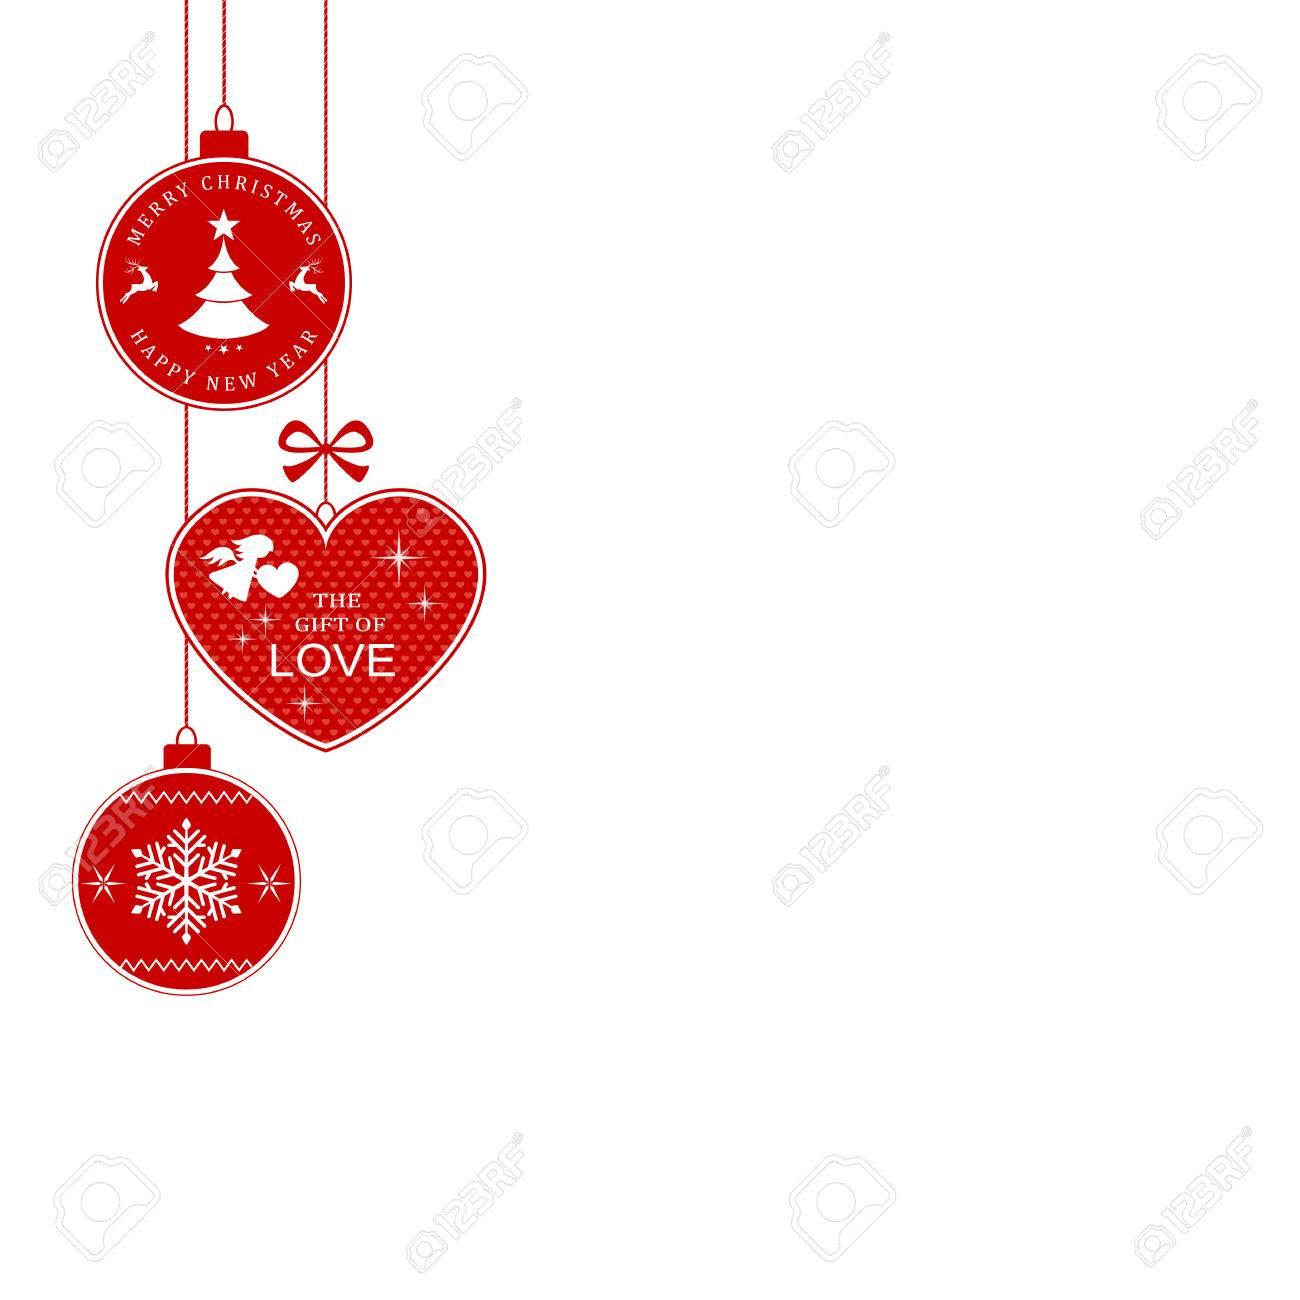 Hanging Christmas Balls And Heart With The Writing Merry Christmas ...